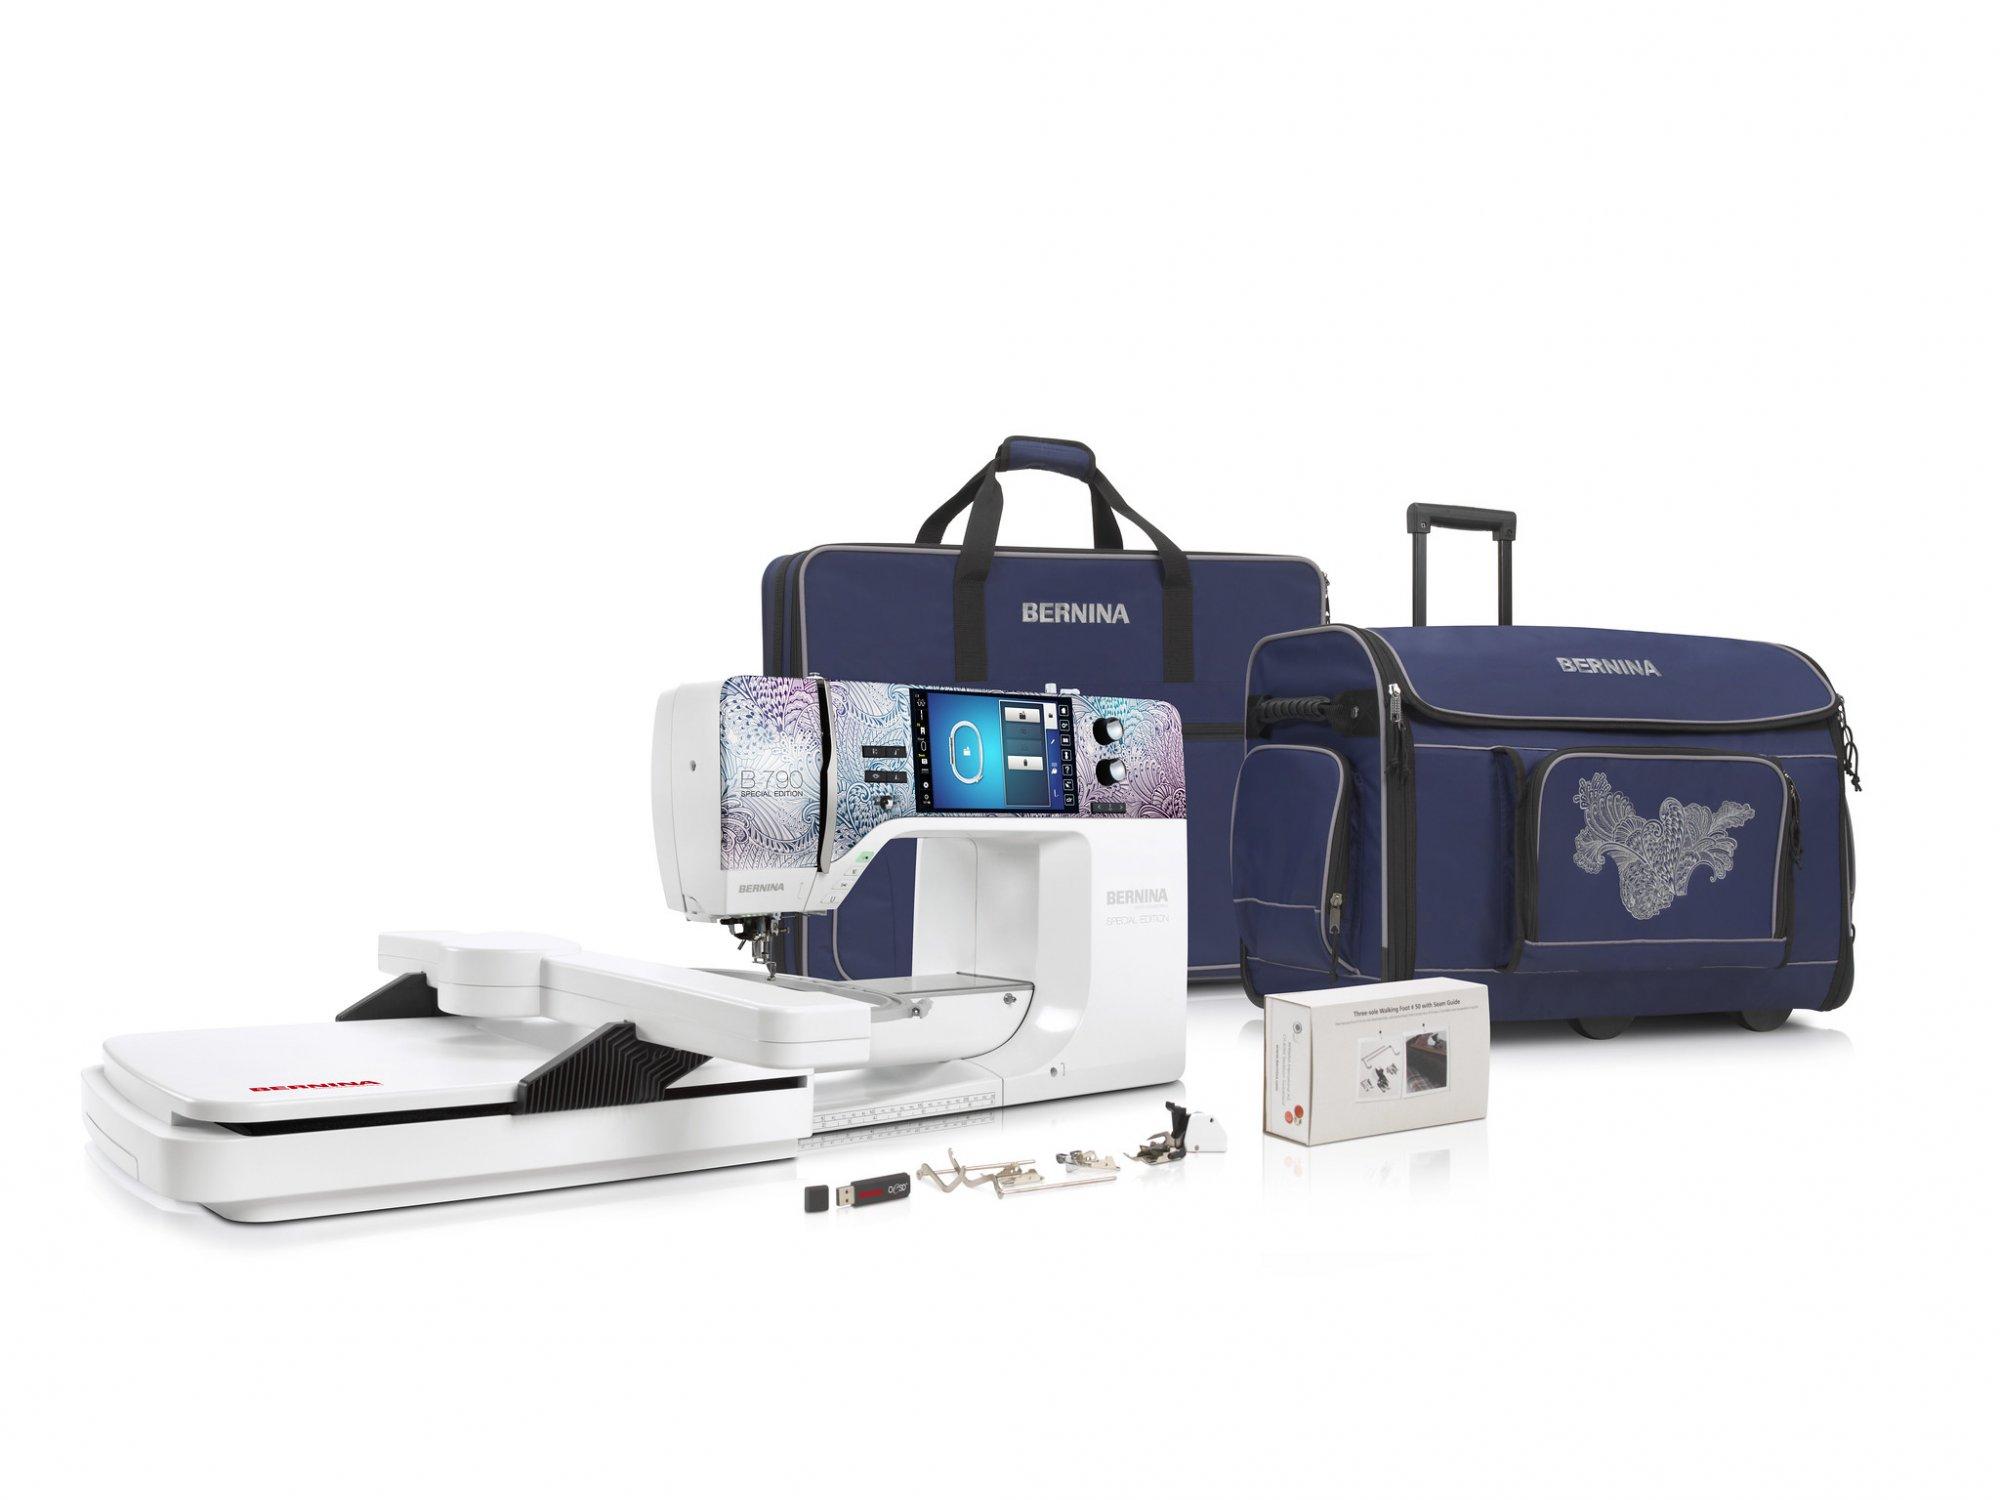 Bernina B-790 PLUS SE sewing and embroidery machine